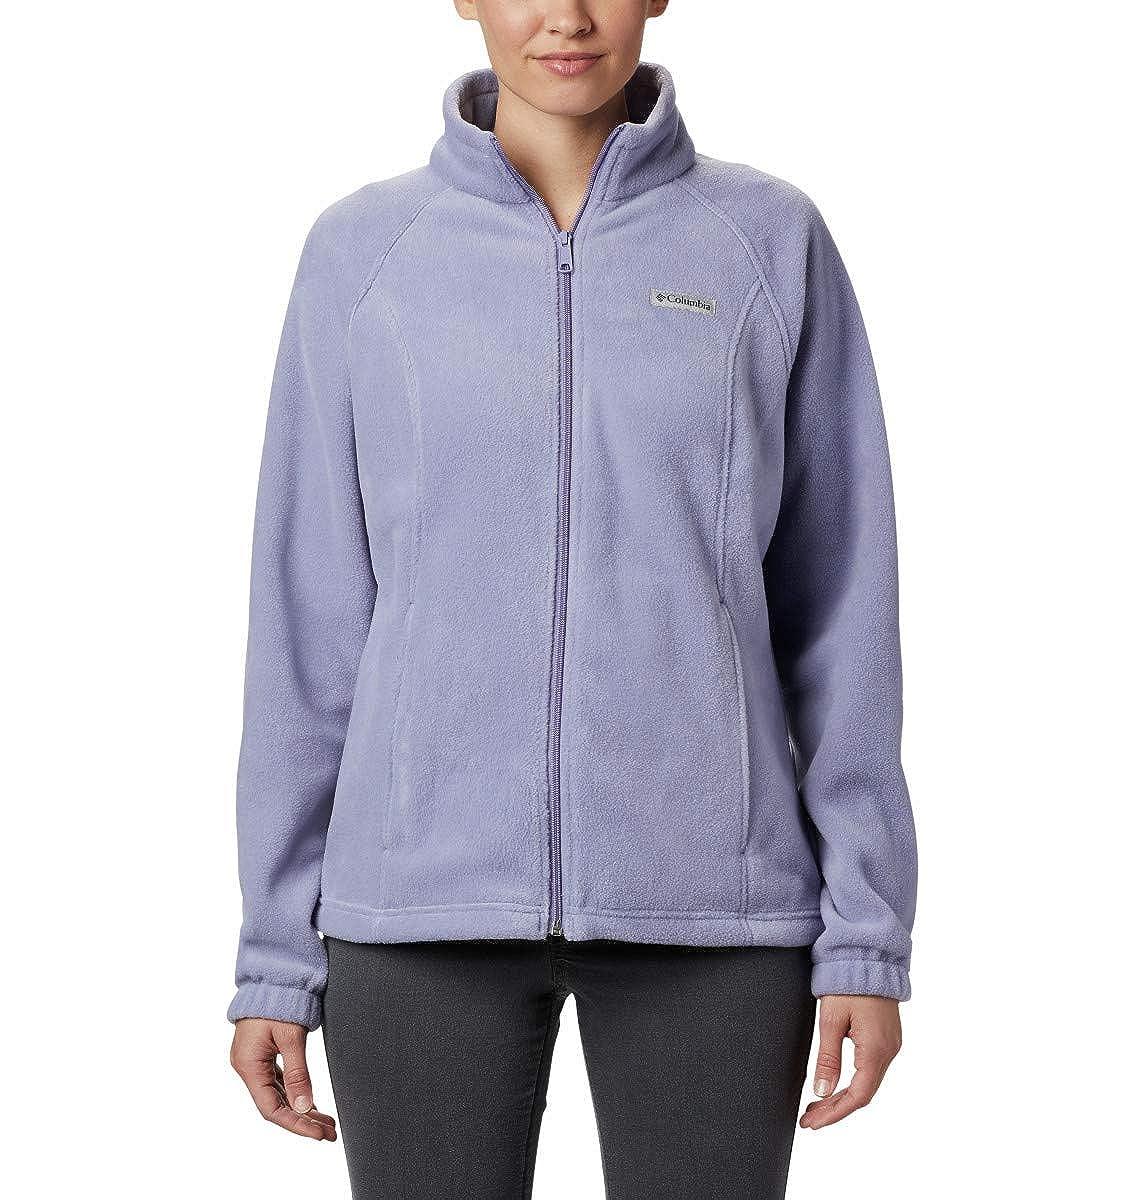 Soft Fleece with Classic Fit Columbia Womens Benton Springs Full Zip Jacket Dusty iris X-Small